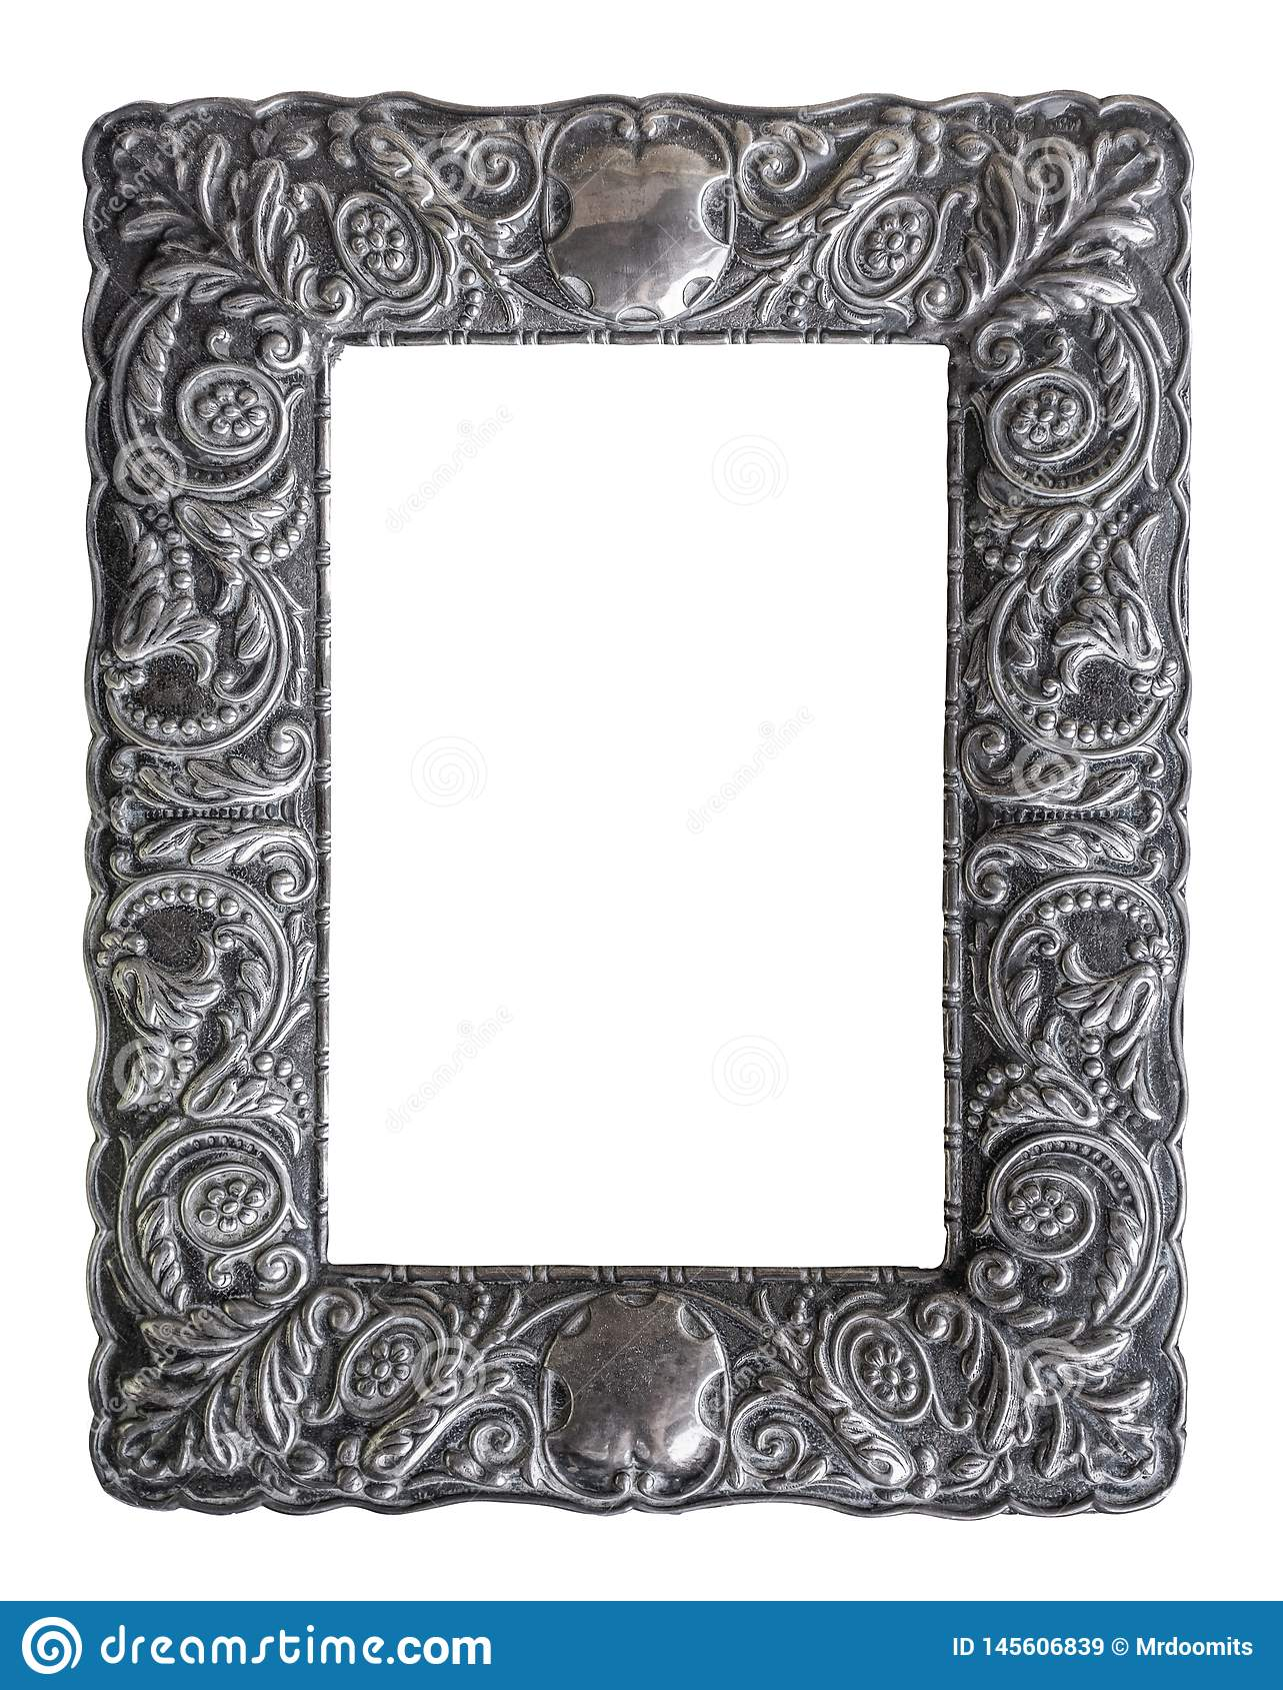 Marco de plata adornado aislado